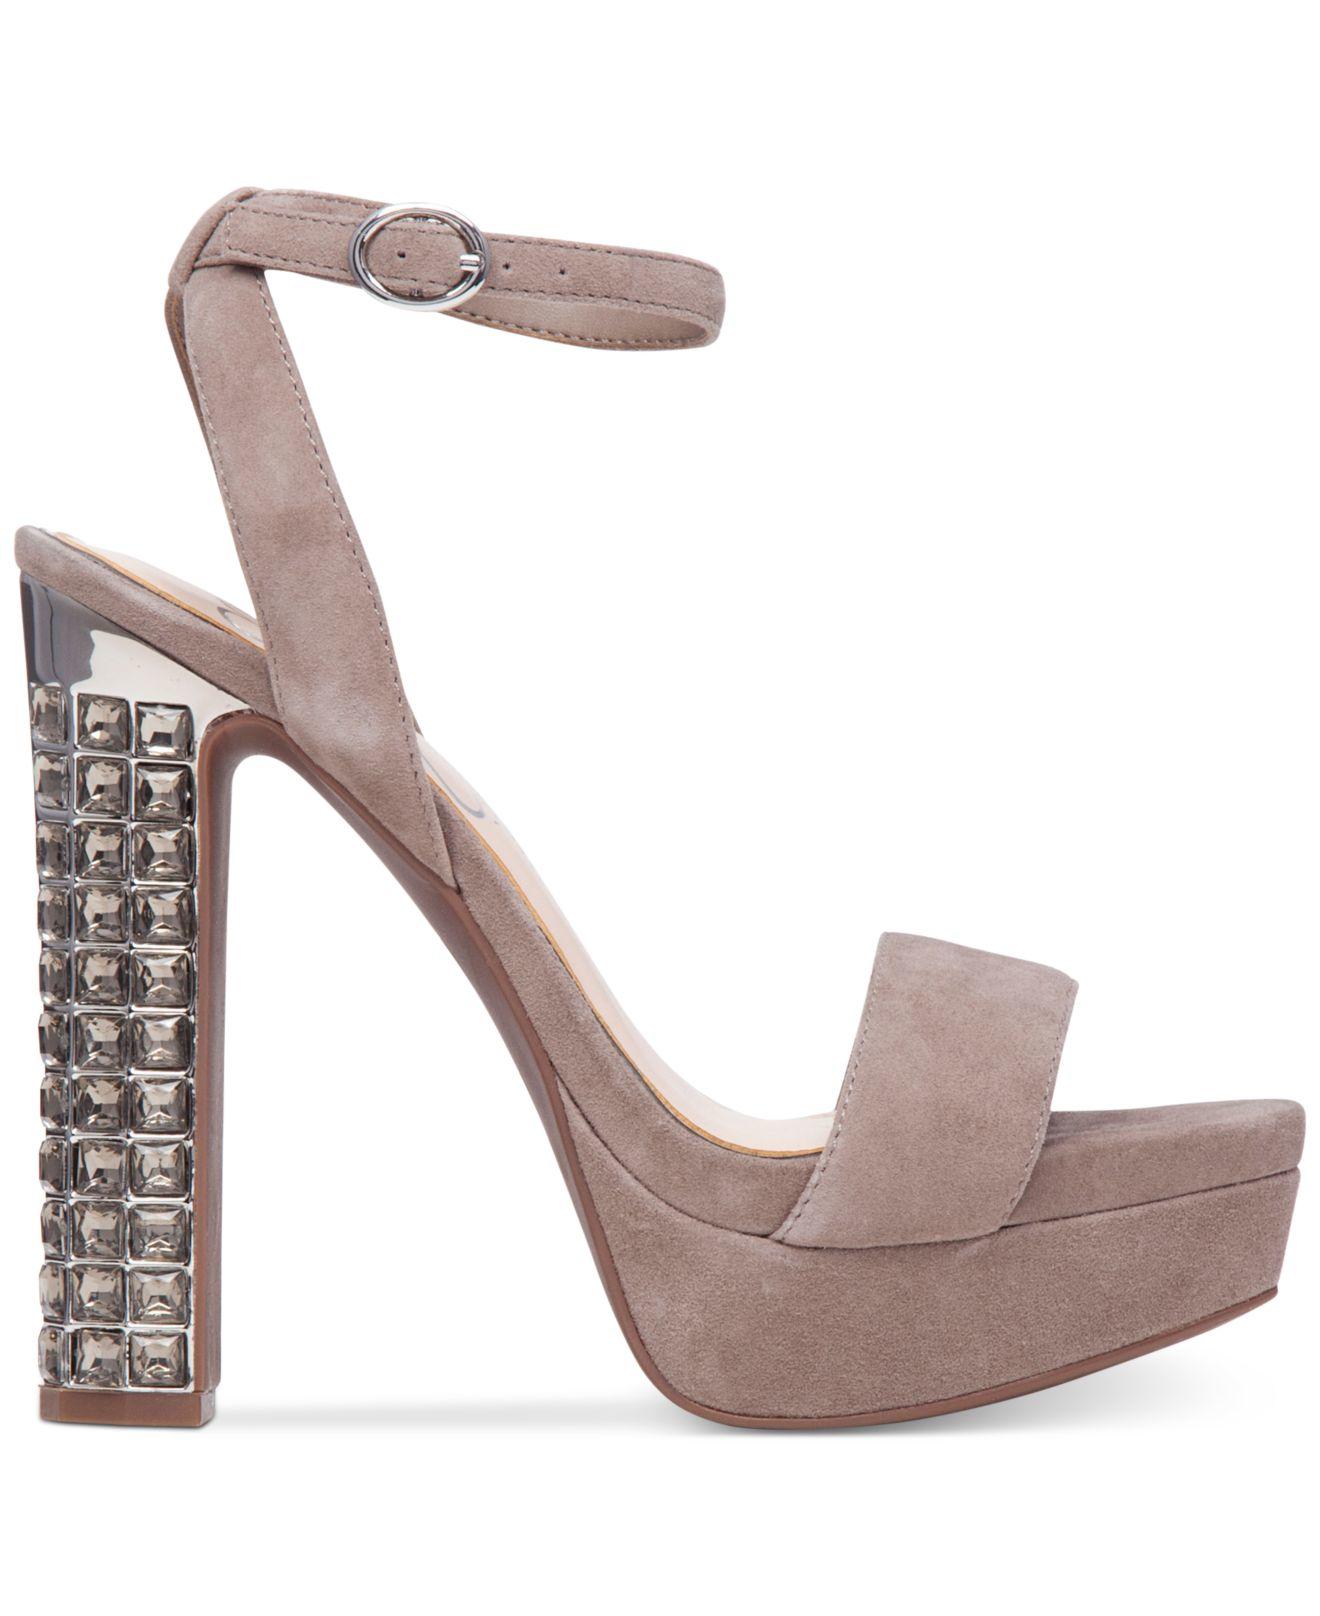 Jessica Simpson Banda Taupe Suede Embellished High Heel